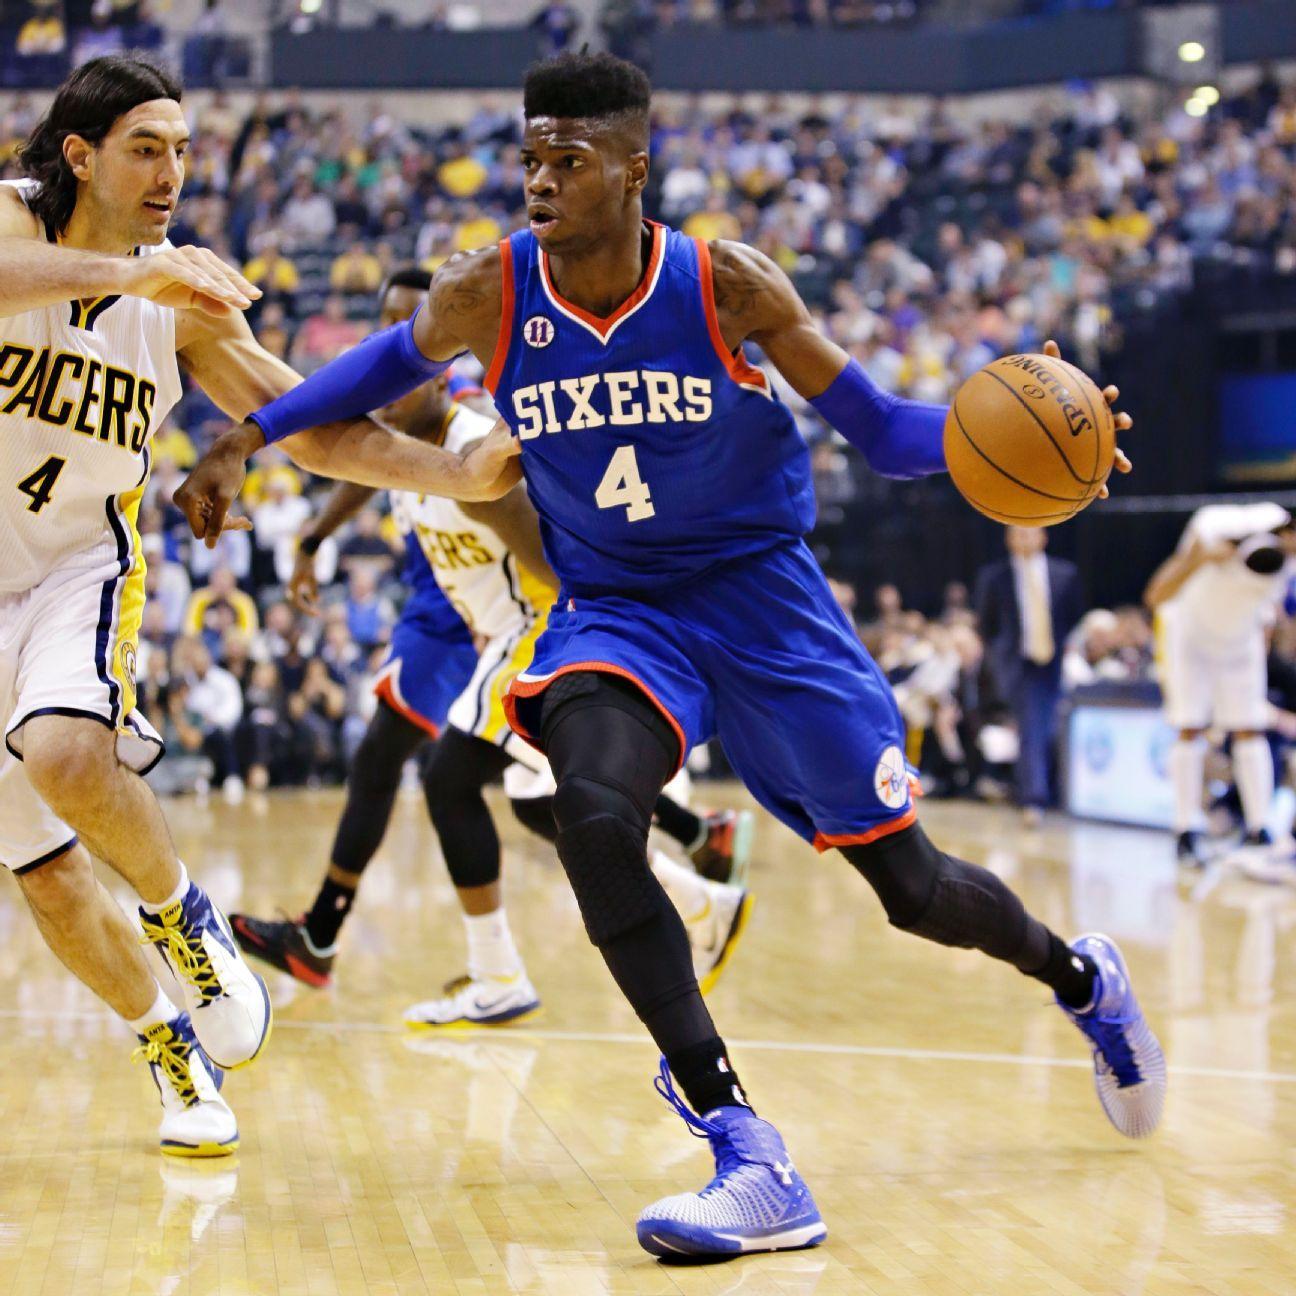 NBA: Philadelphia 76ers Player Profiles